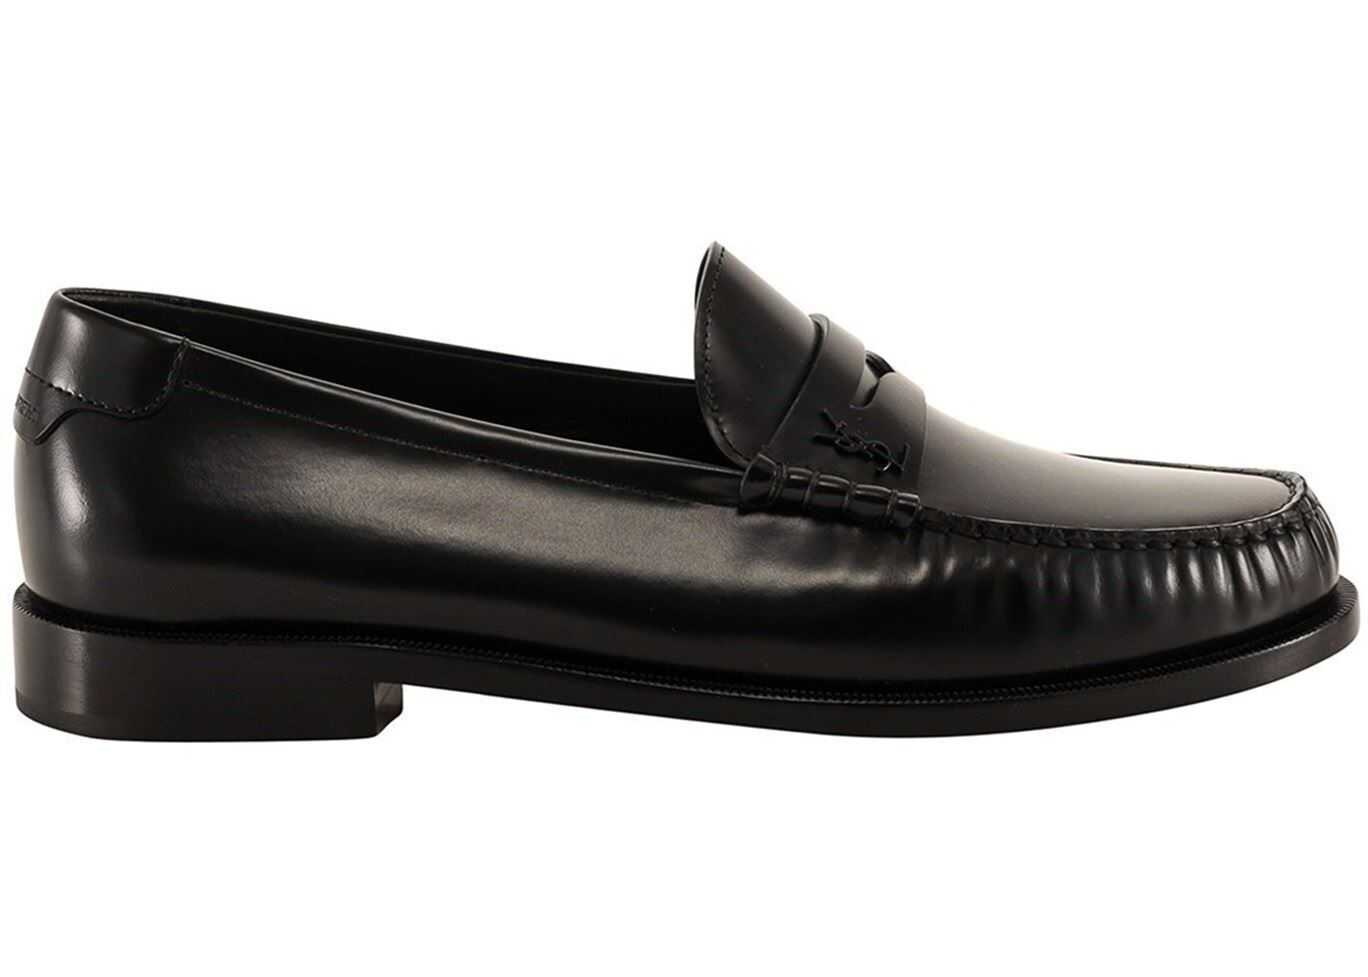 Saint Laurent Brushed Leather Loafers In Black 6304741VUVV1000 Black imagine b-mall.ro